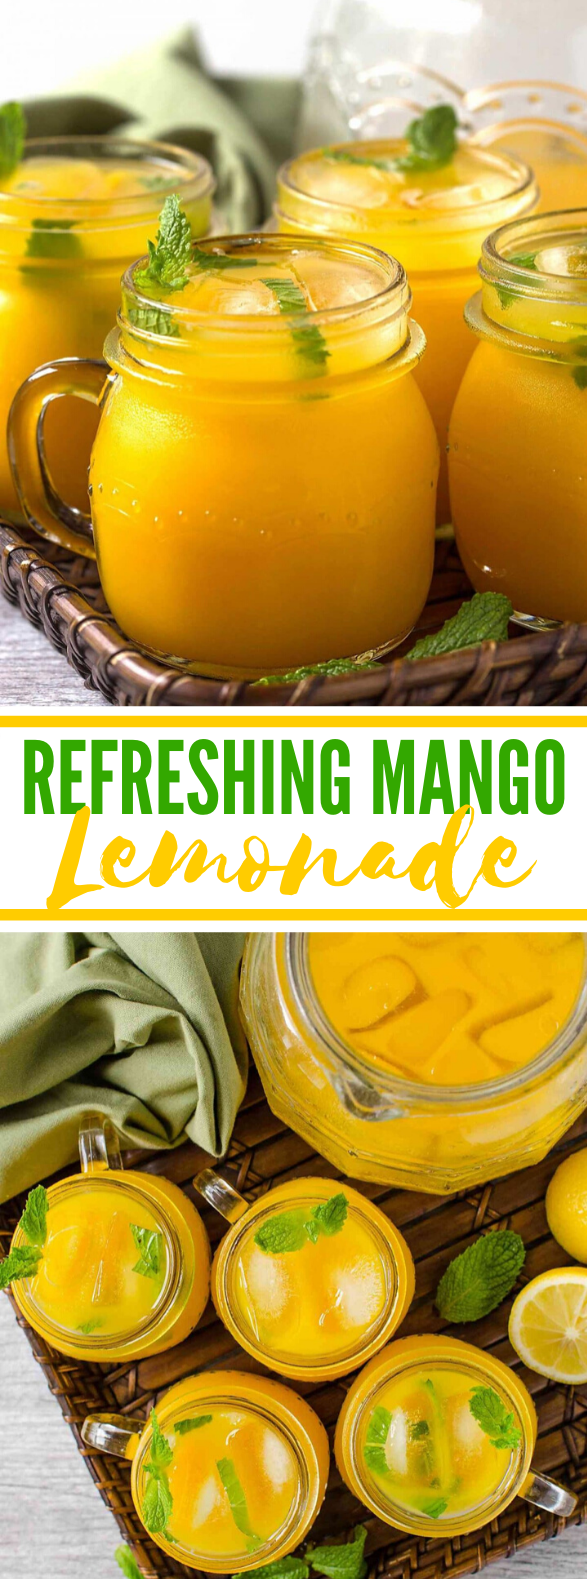 REFRESHING HOMEMADE MANGO LEMONADE #drinks #summer